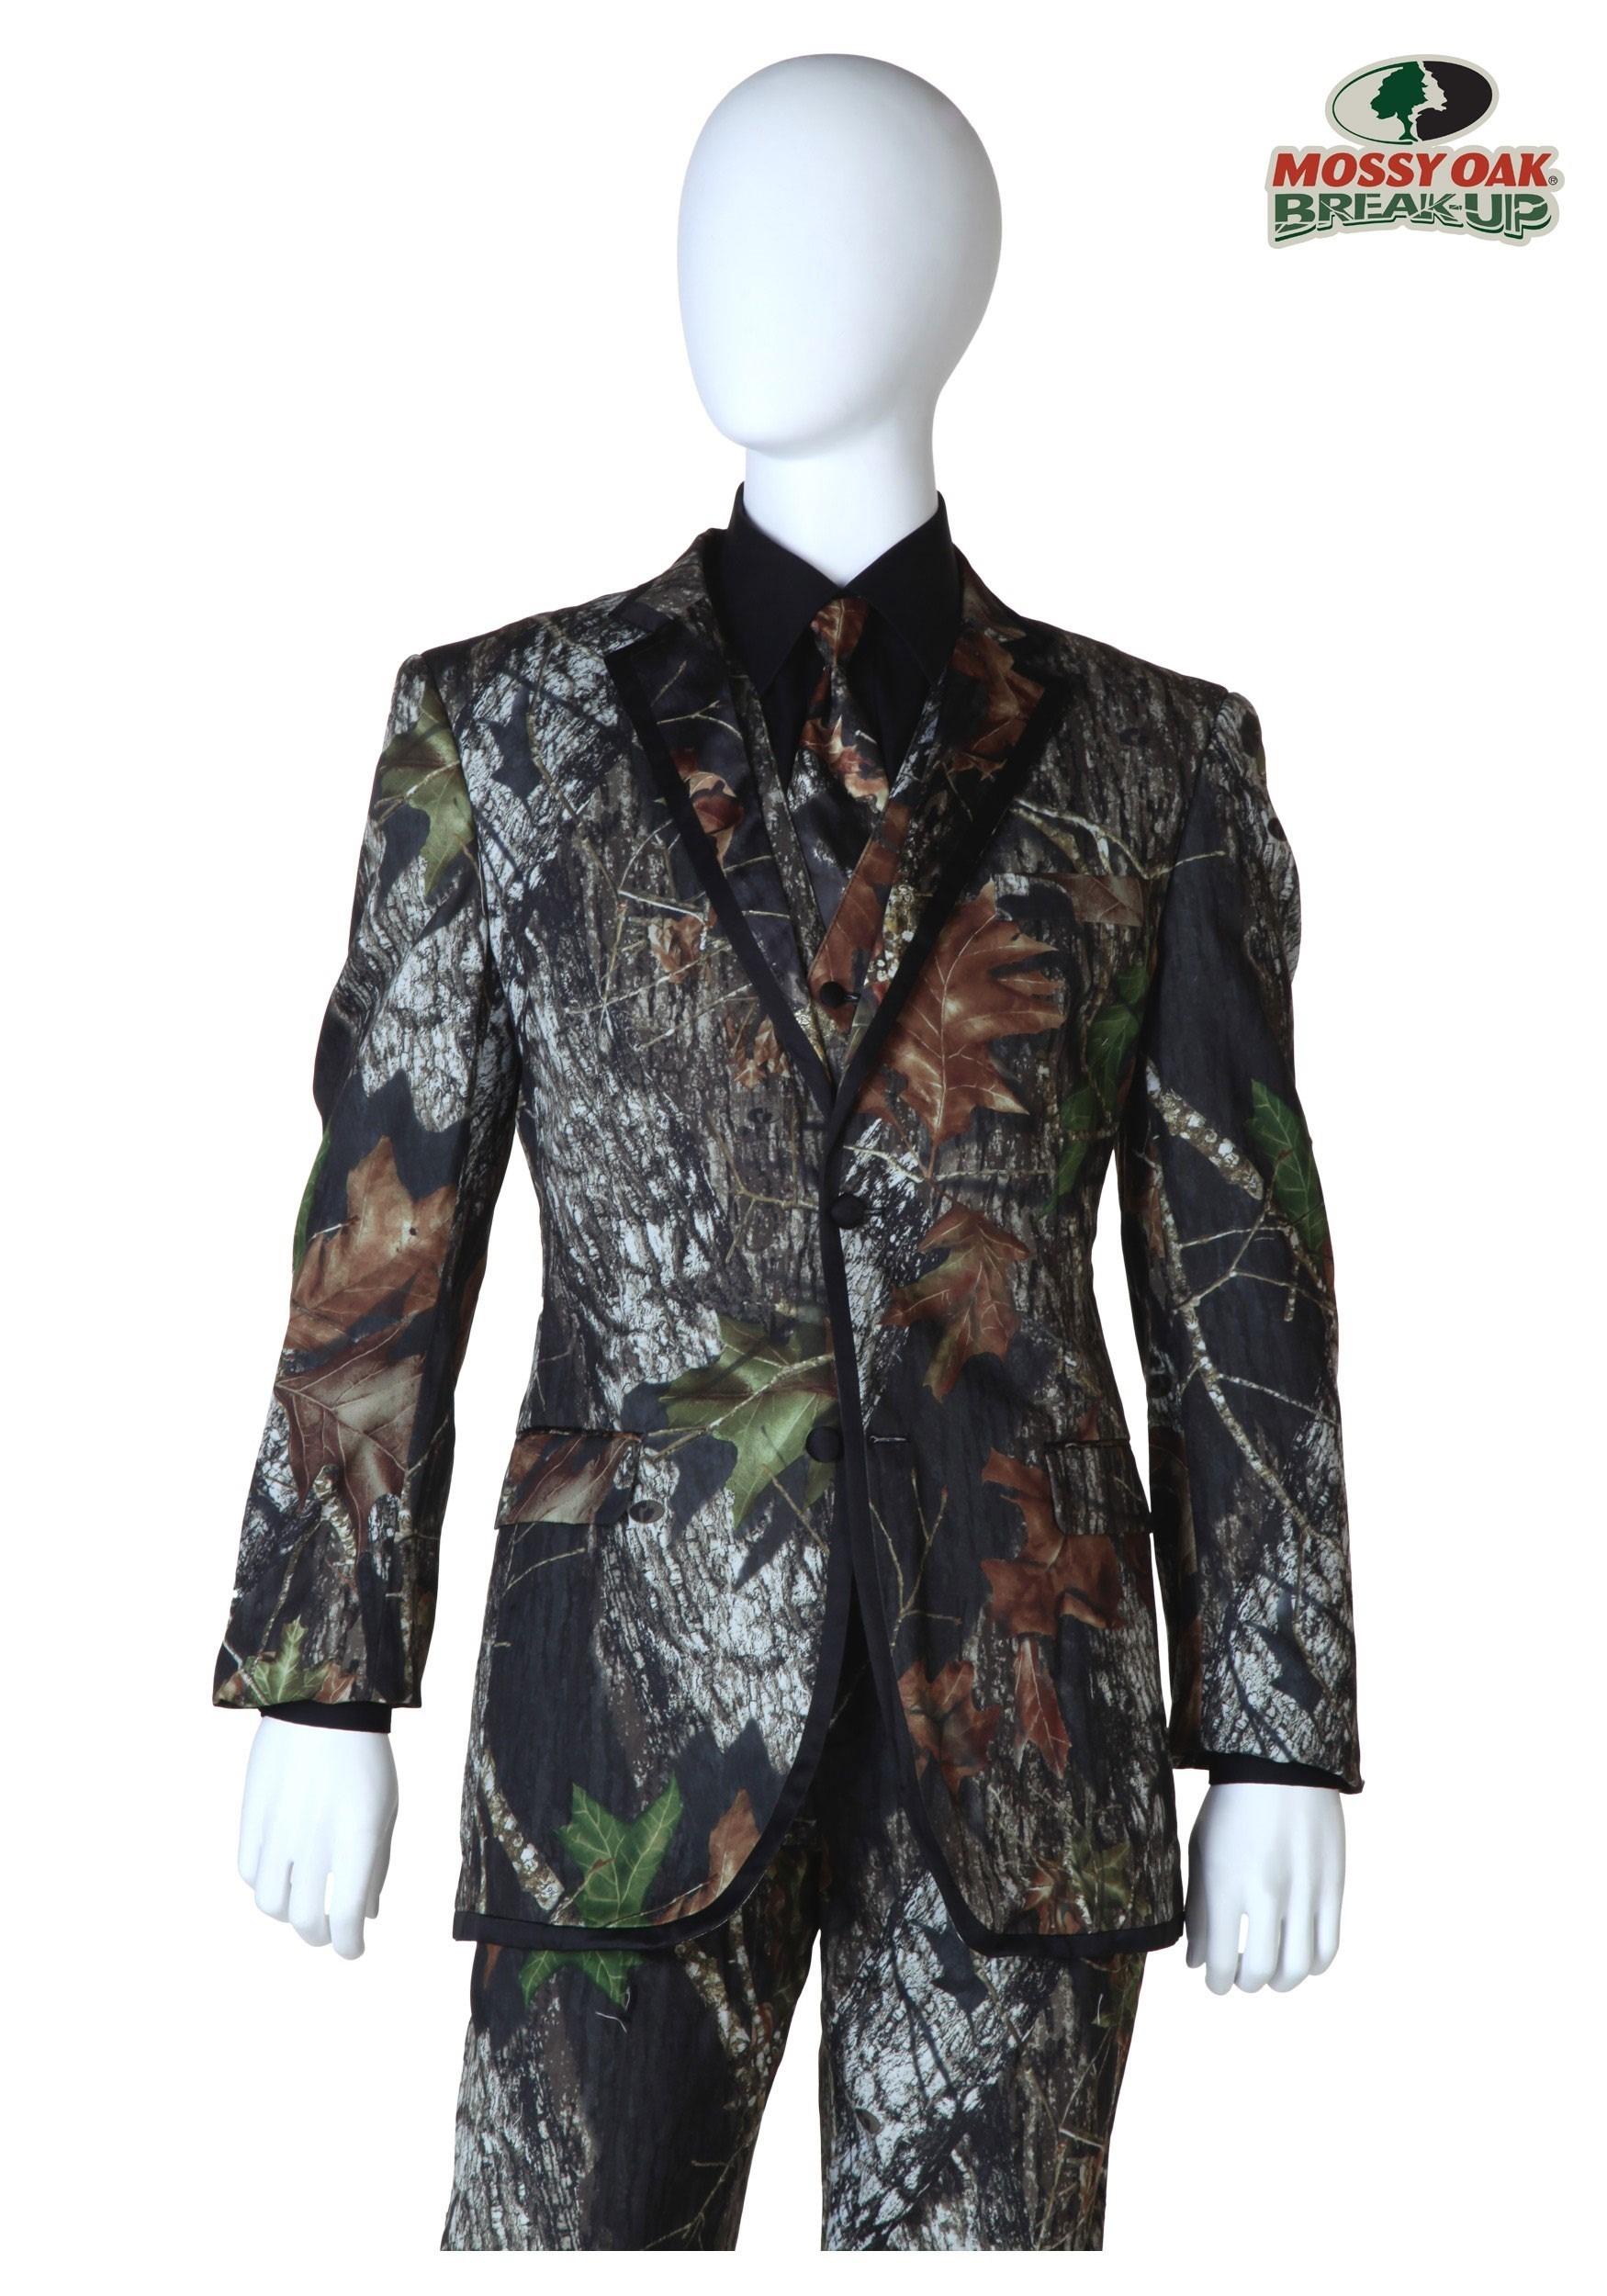 Duck Dynasty Costumes & Accessories - HalloweenCostumes.com